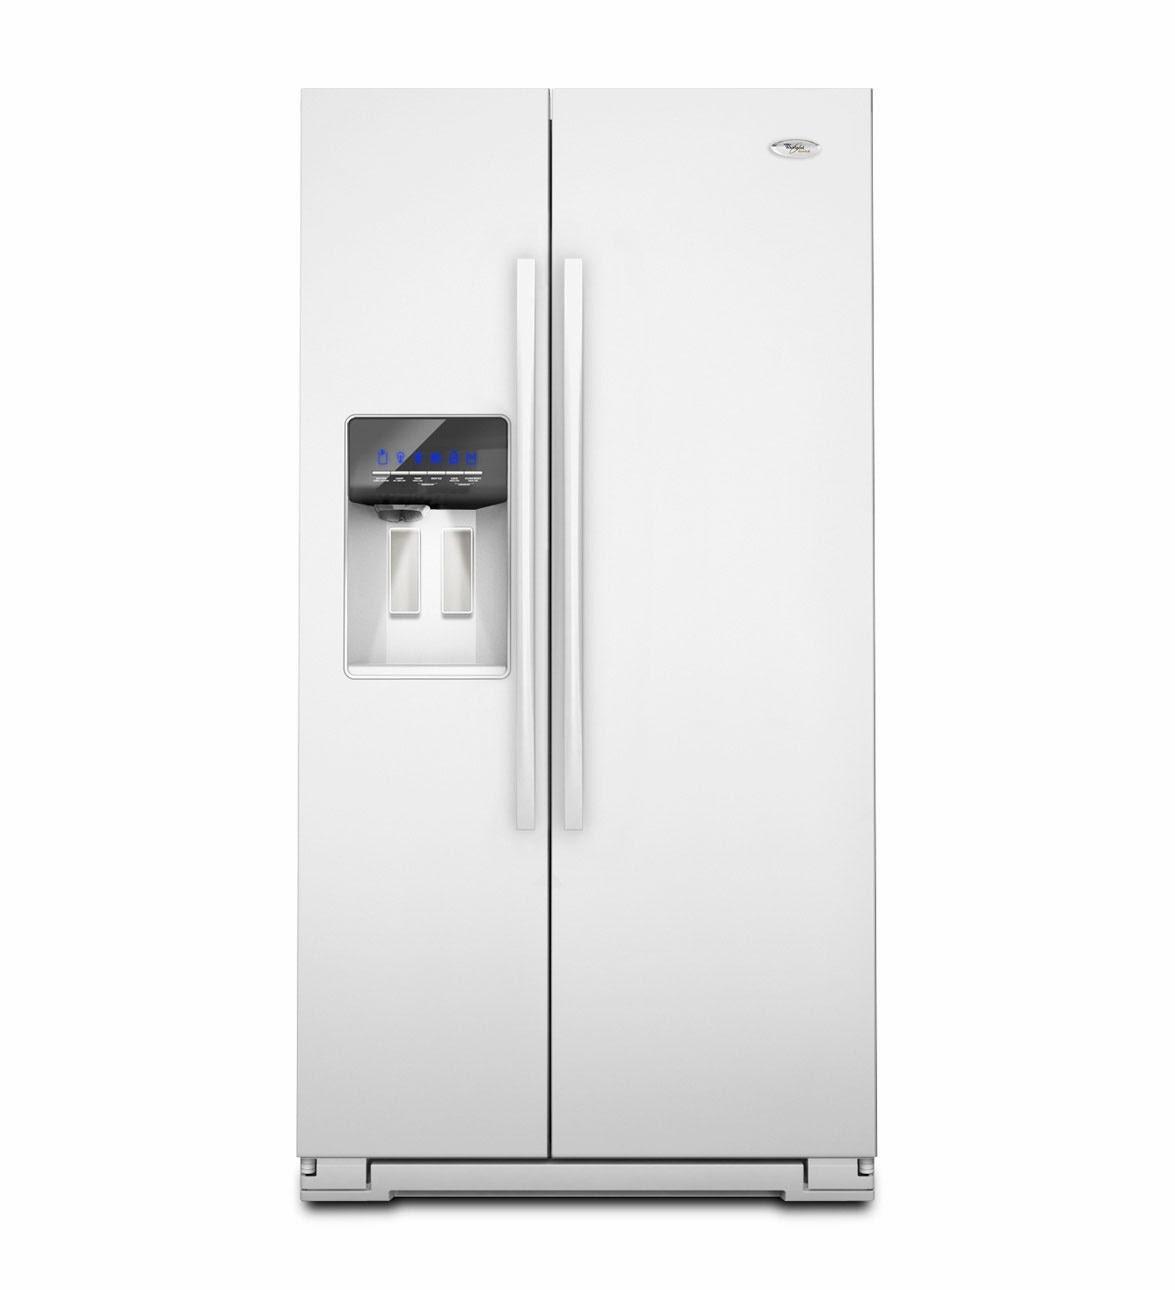 Whirlpool Refrigerator Brand Gsf26c4exw Gold White